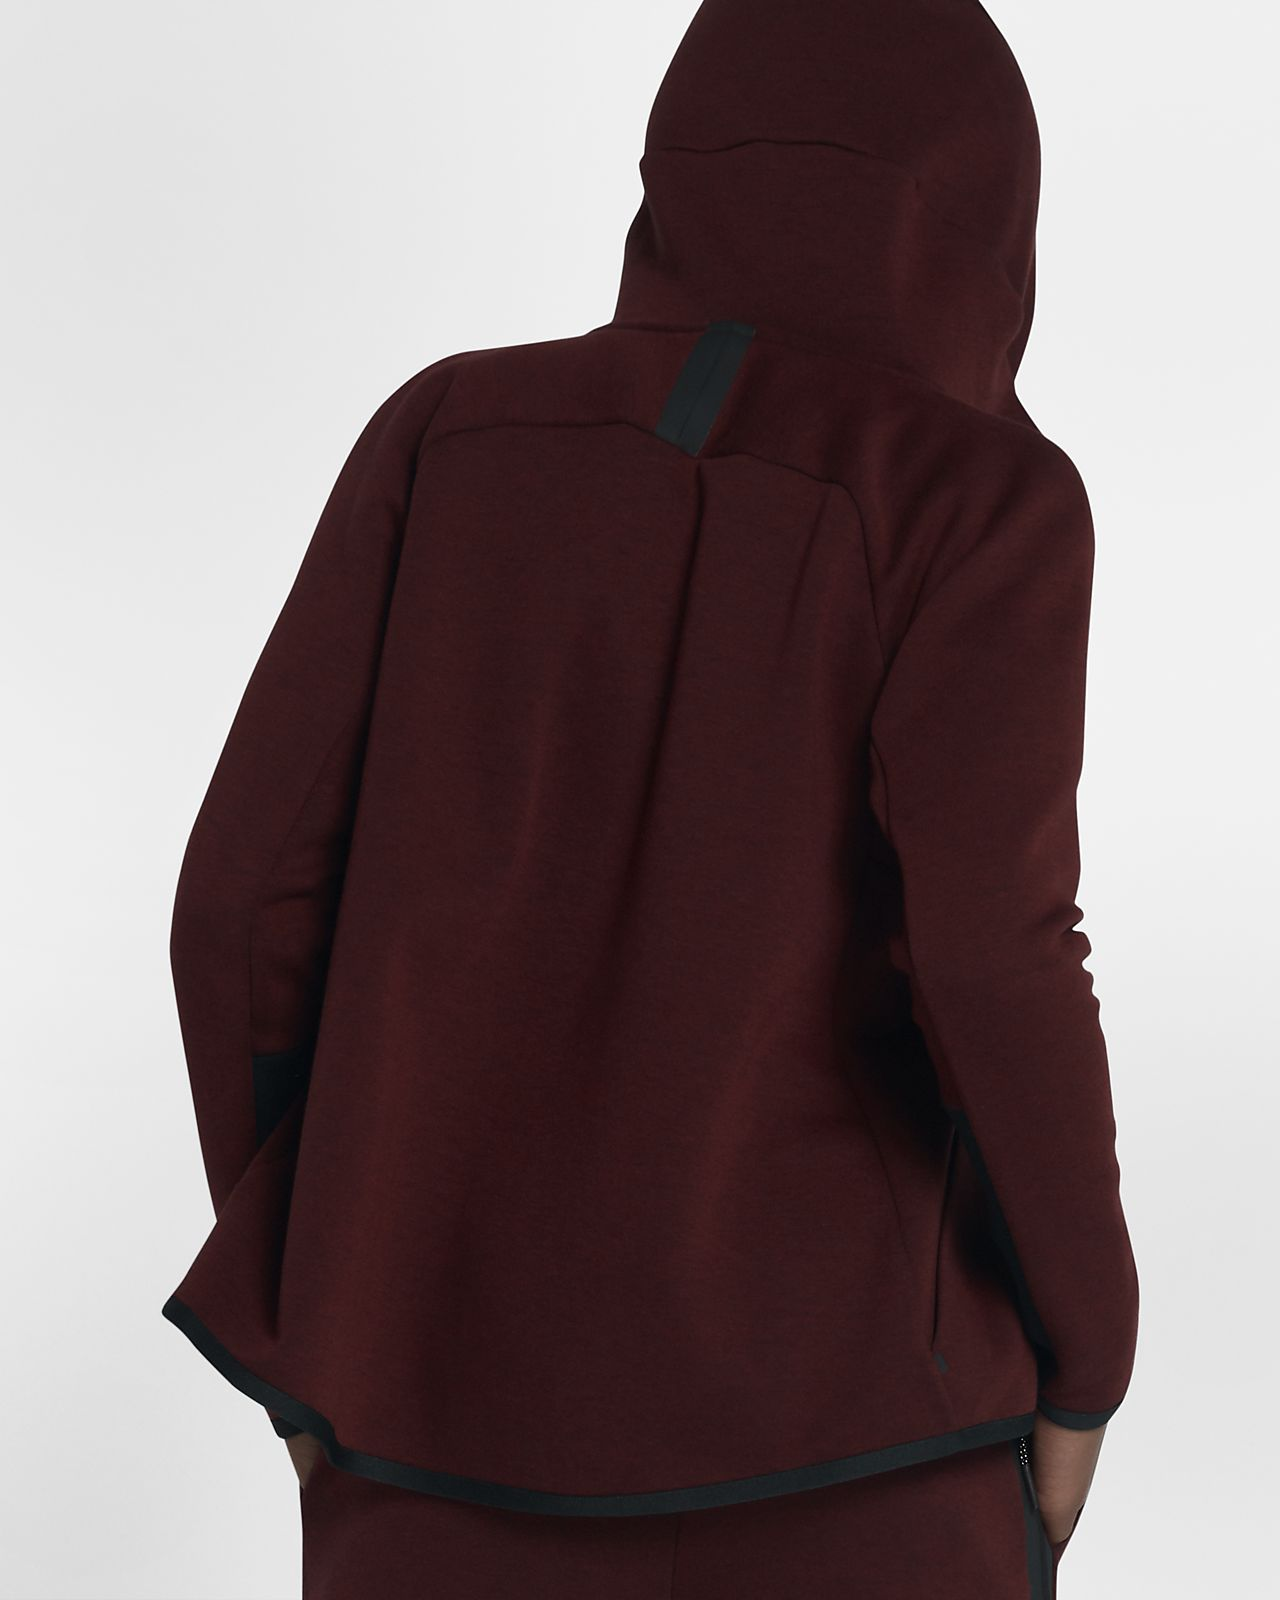 nike tech fleece hoodie purple online   OFF72% Discounts e0cdc3af36